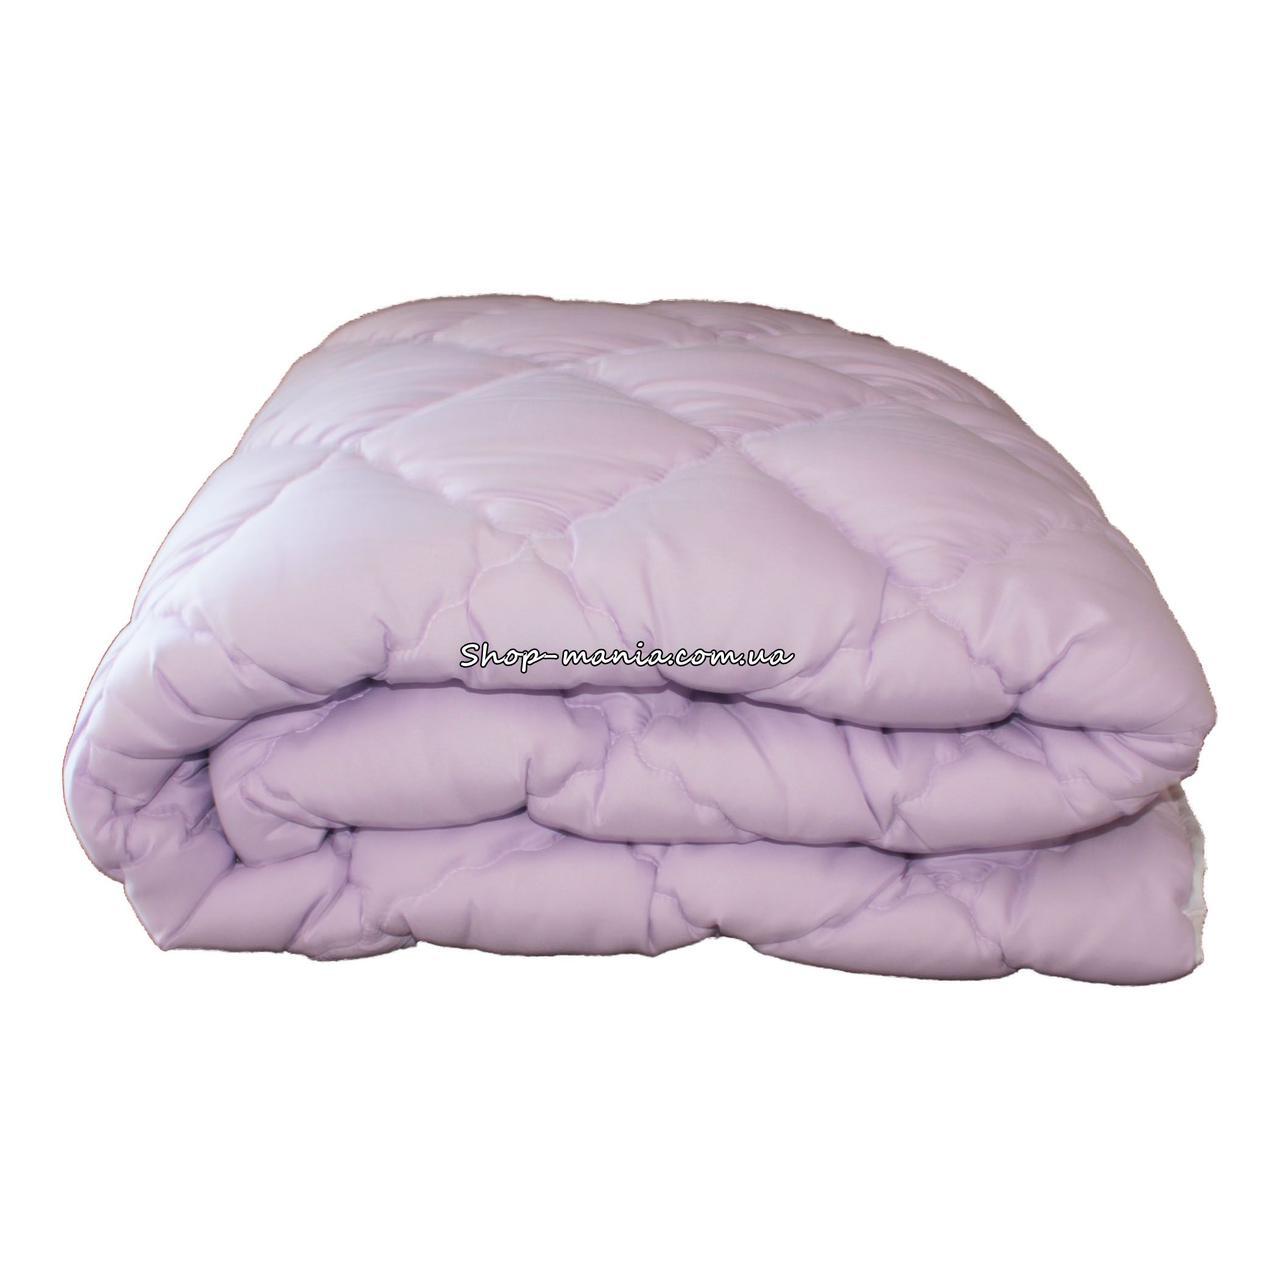 Одеяло зимнее теплое стеганное двуспальное 175х210 см холлофайбер ODA SM 8001-2 purple